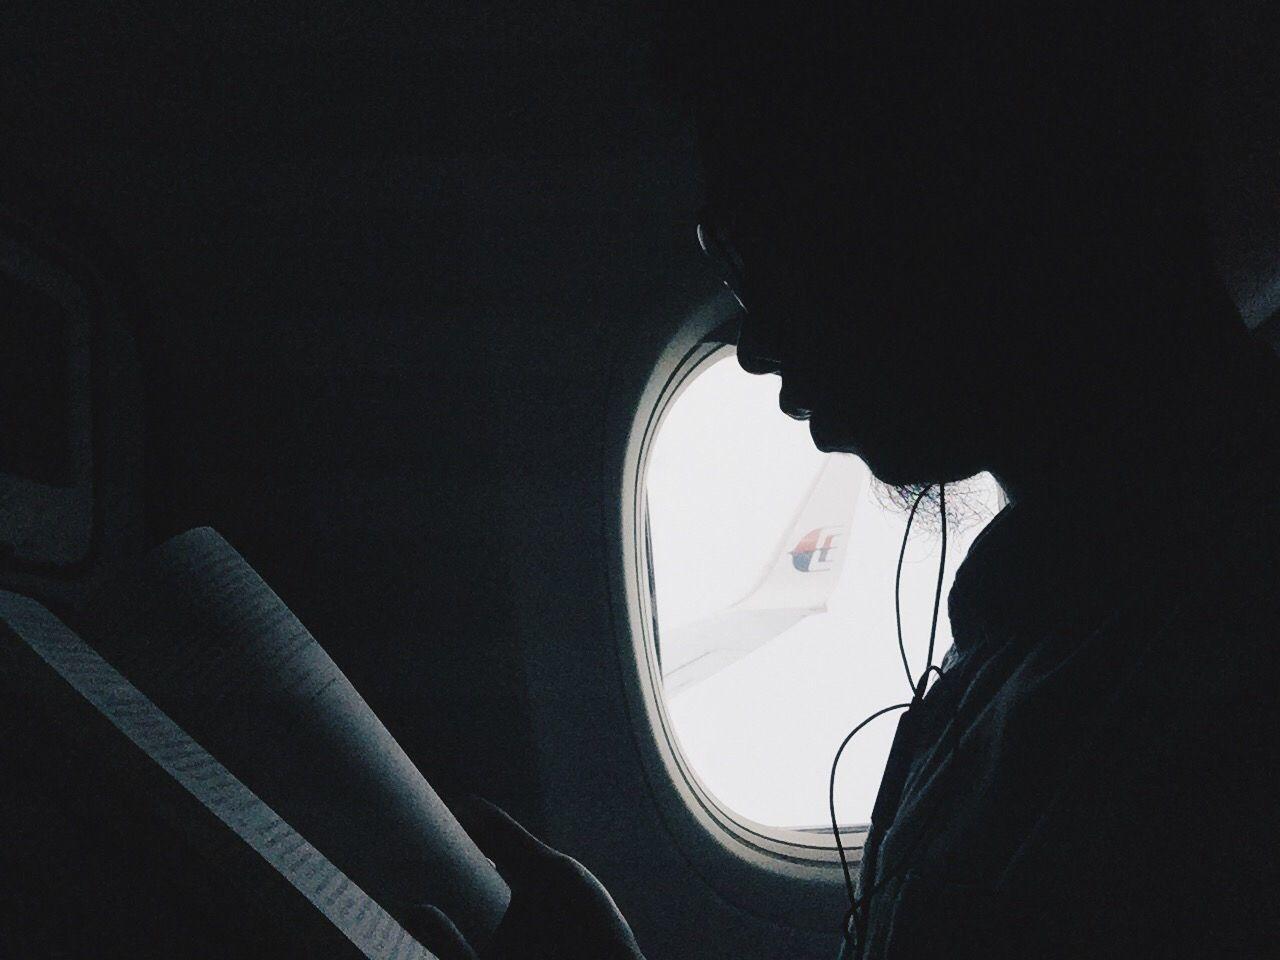 MAN SITTING IN AIRPLANE